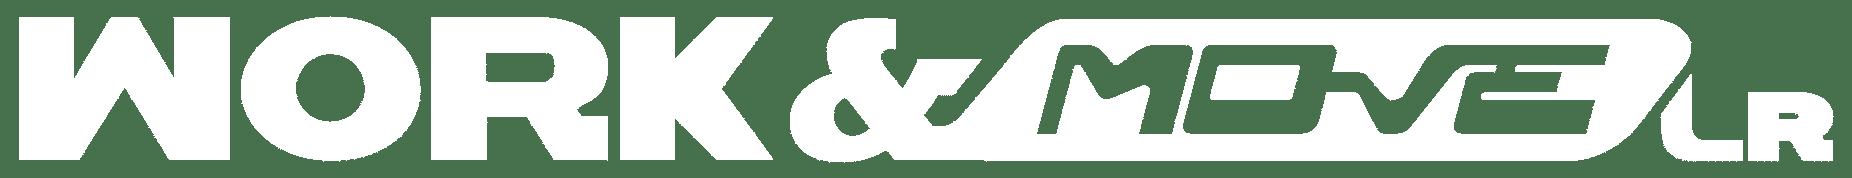 workandmove logo blanc